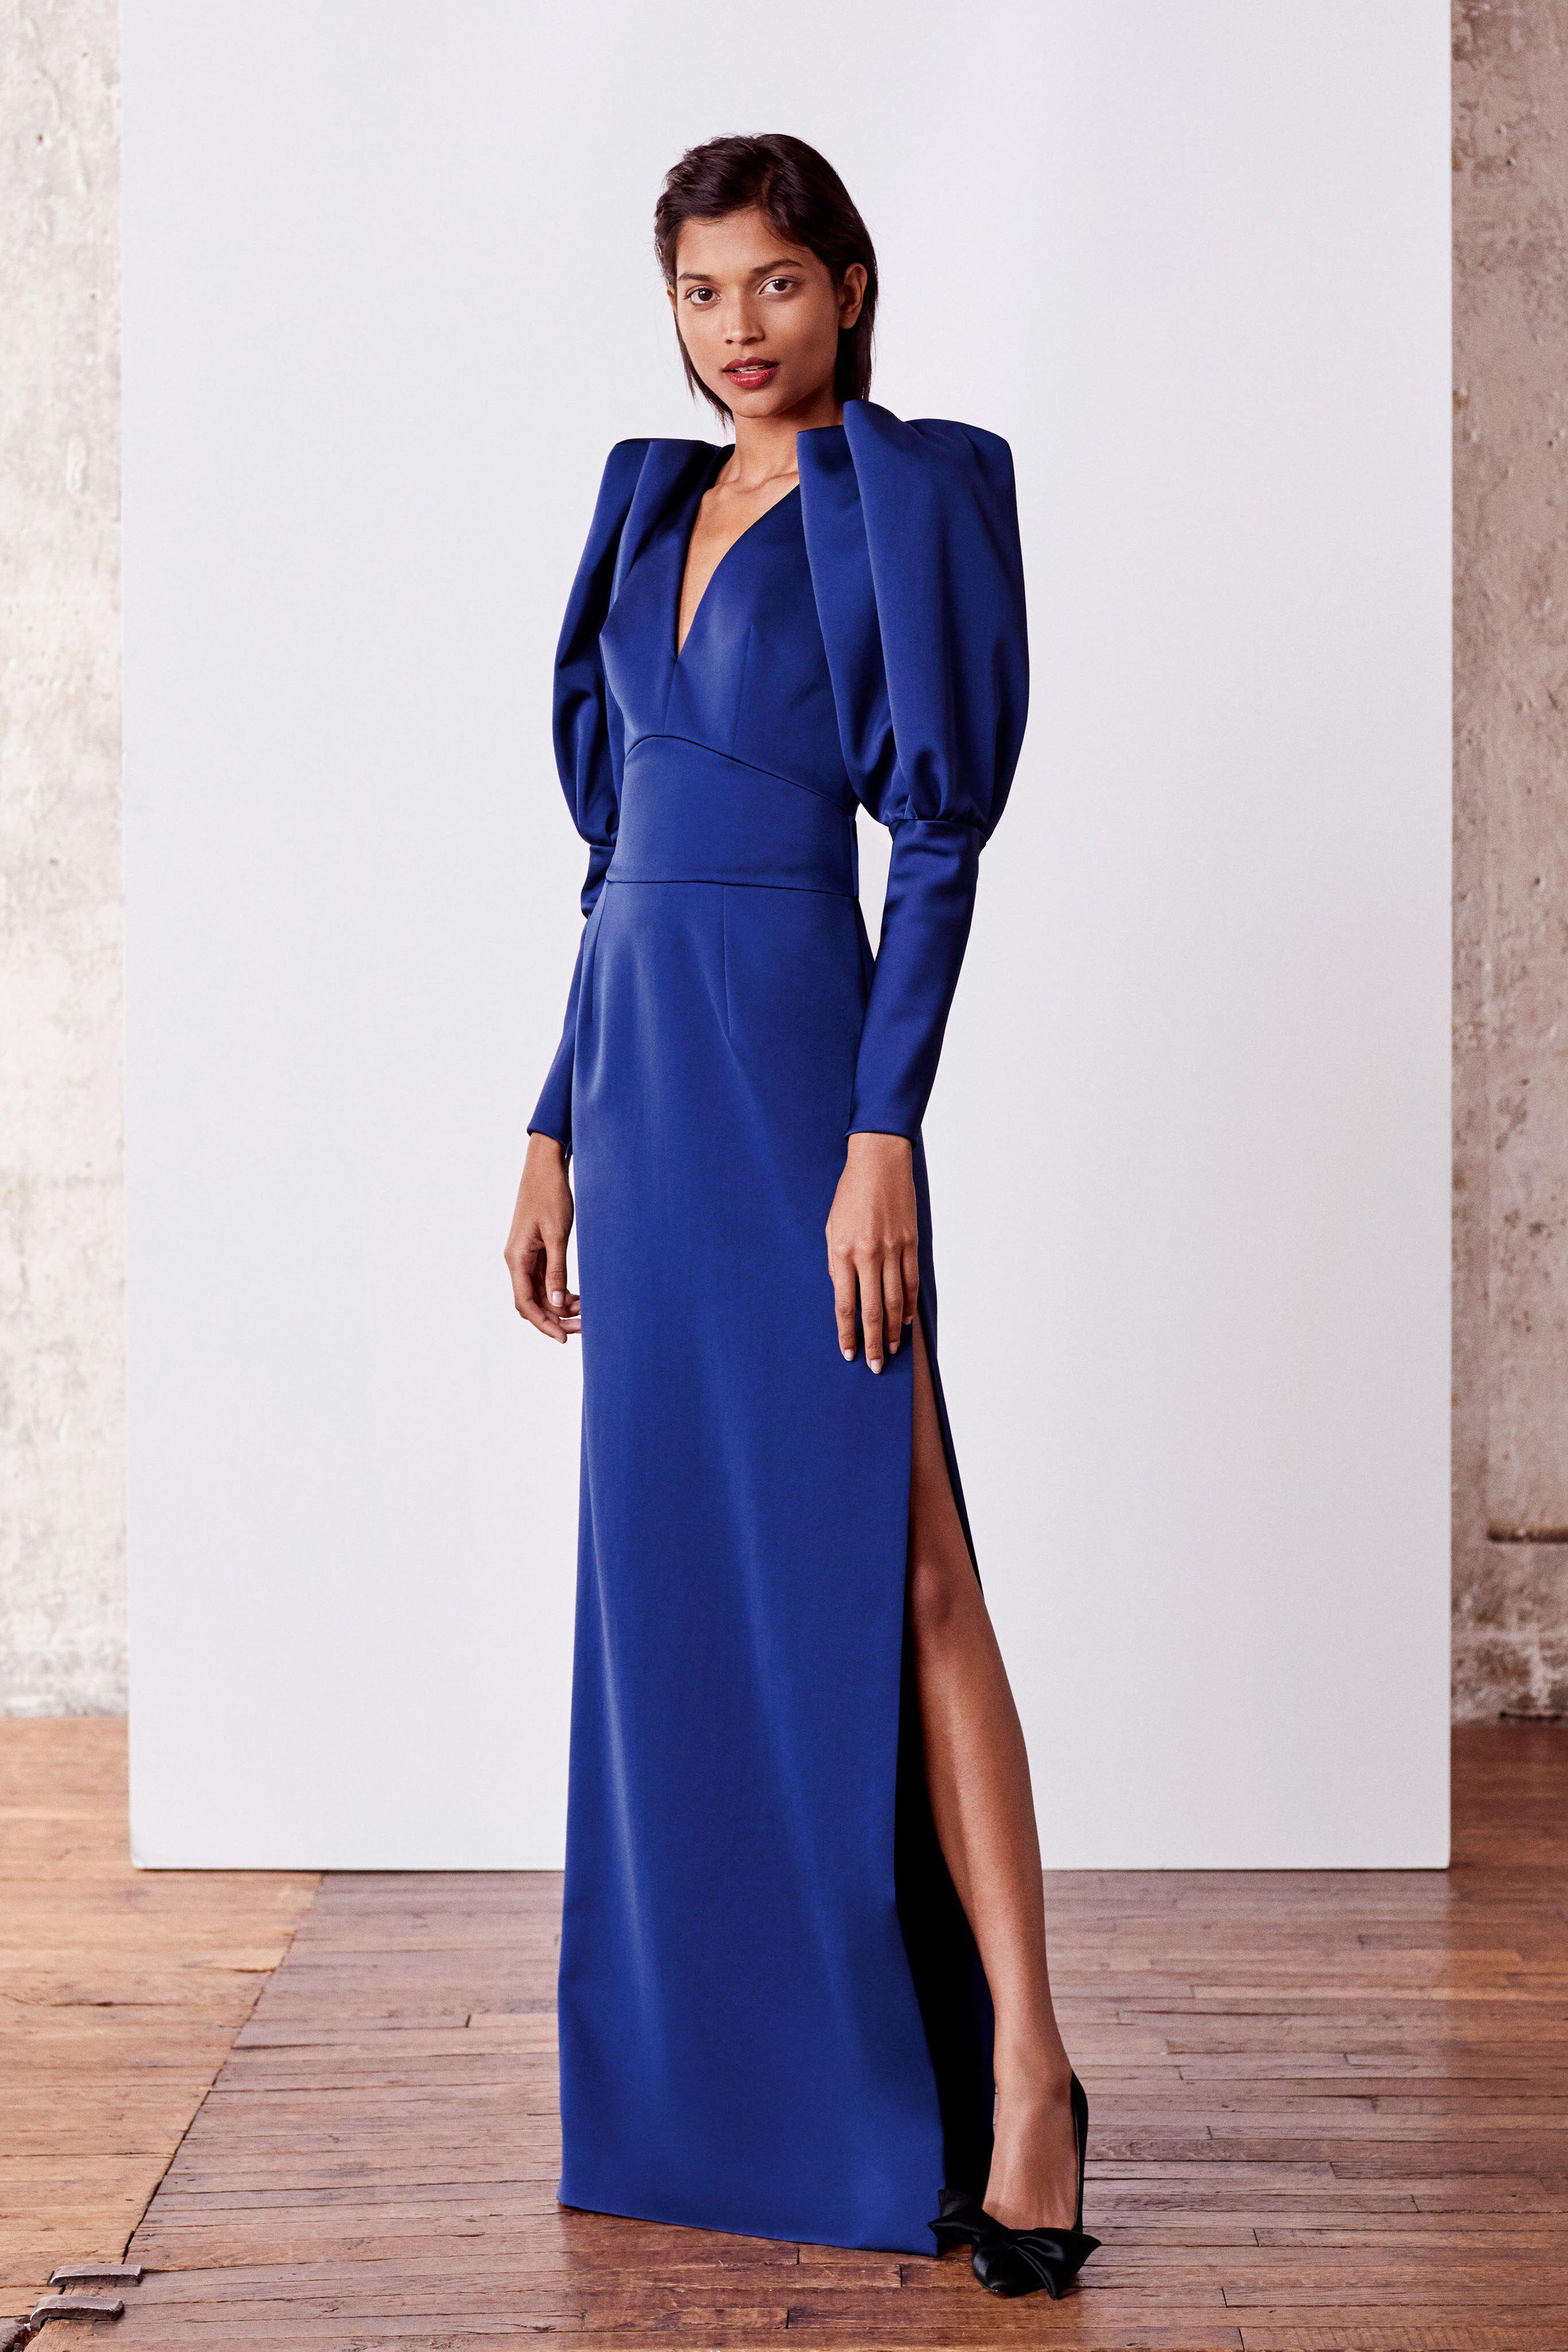 Pin By Kamlesh On Ka In 2019: Pin On Fashion Dresses